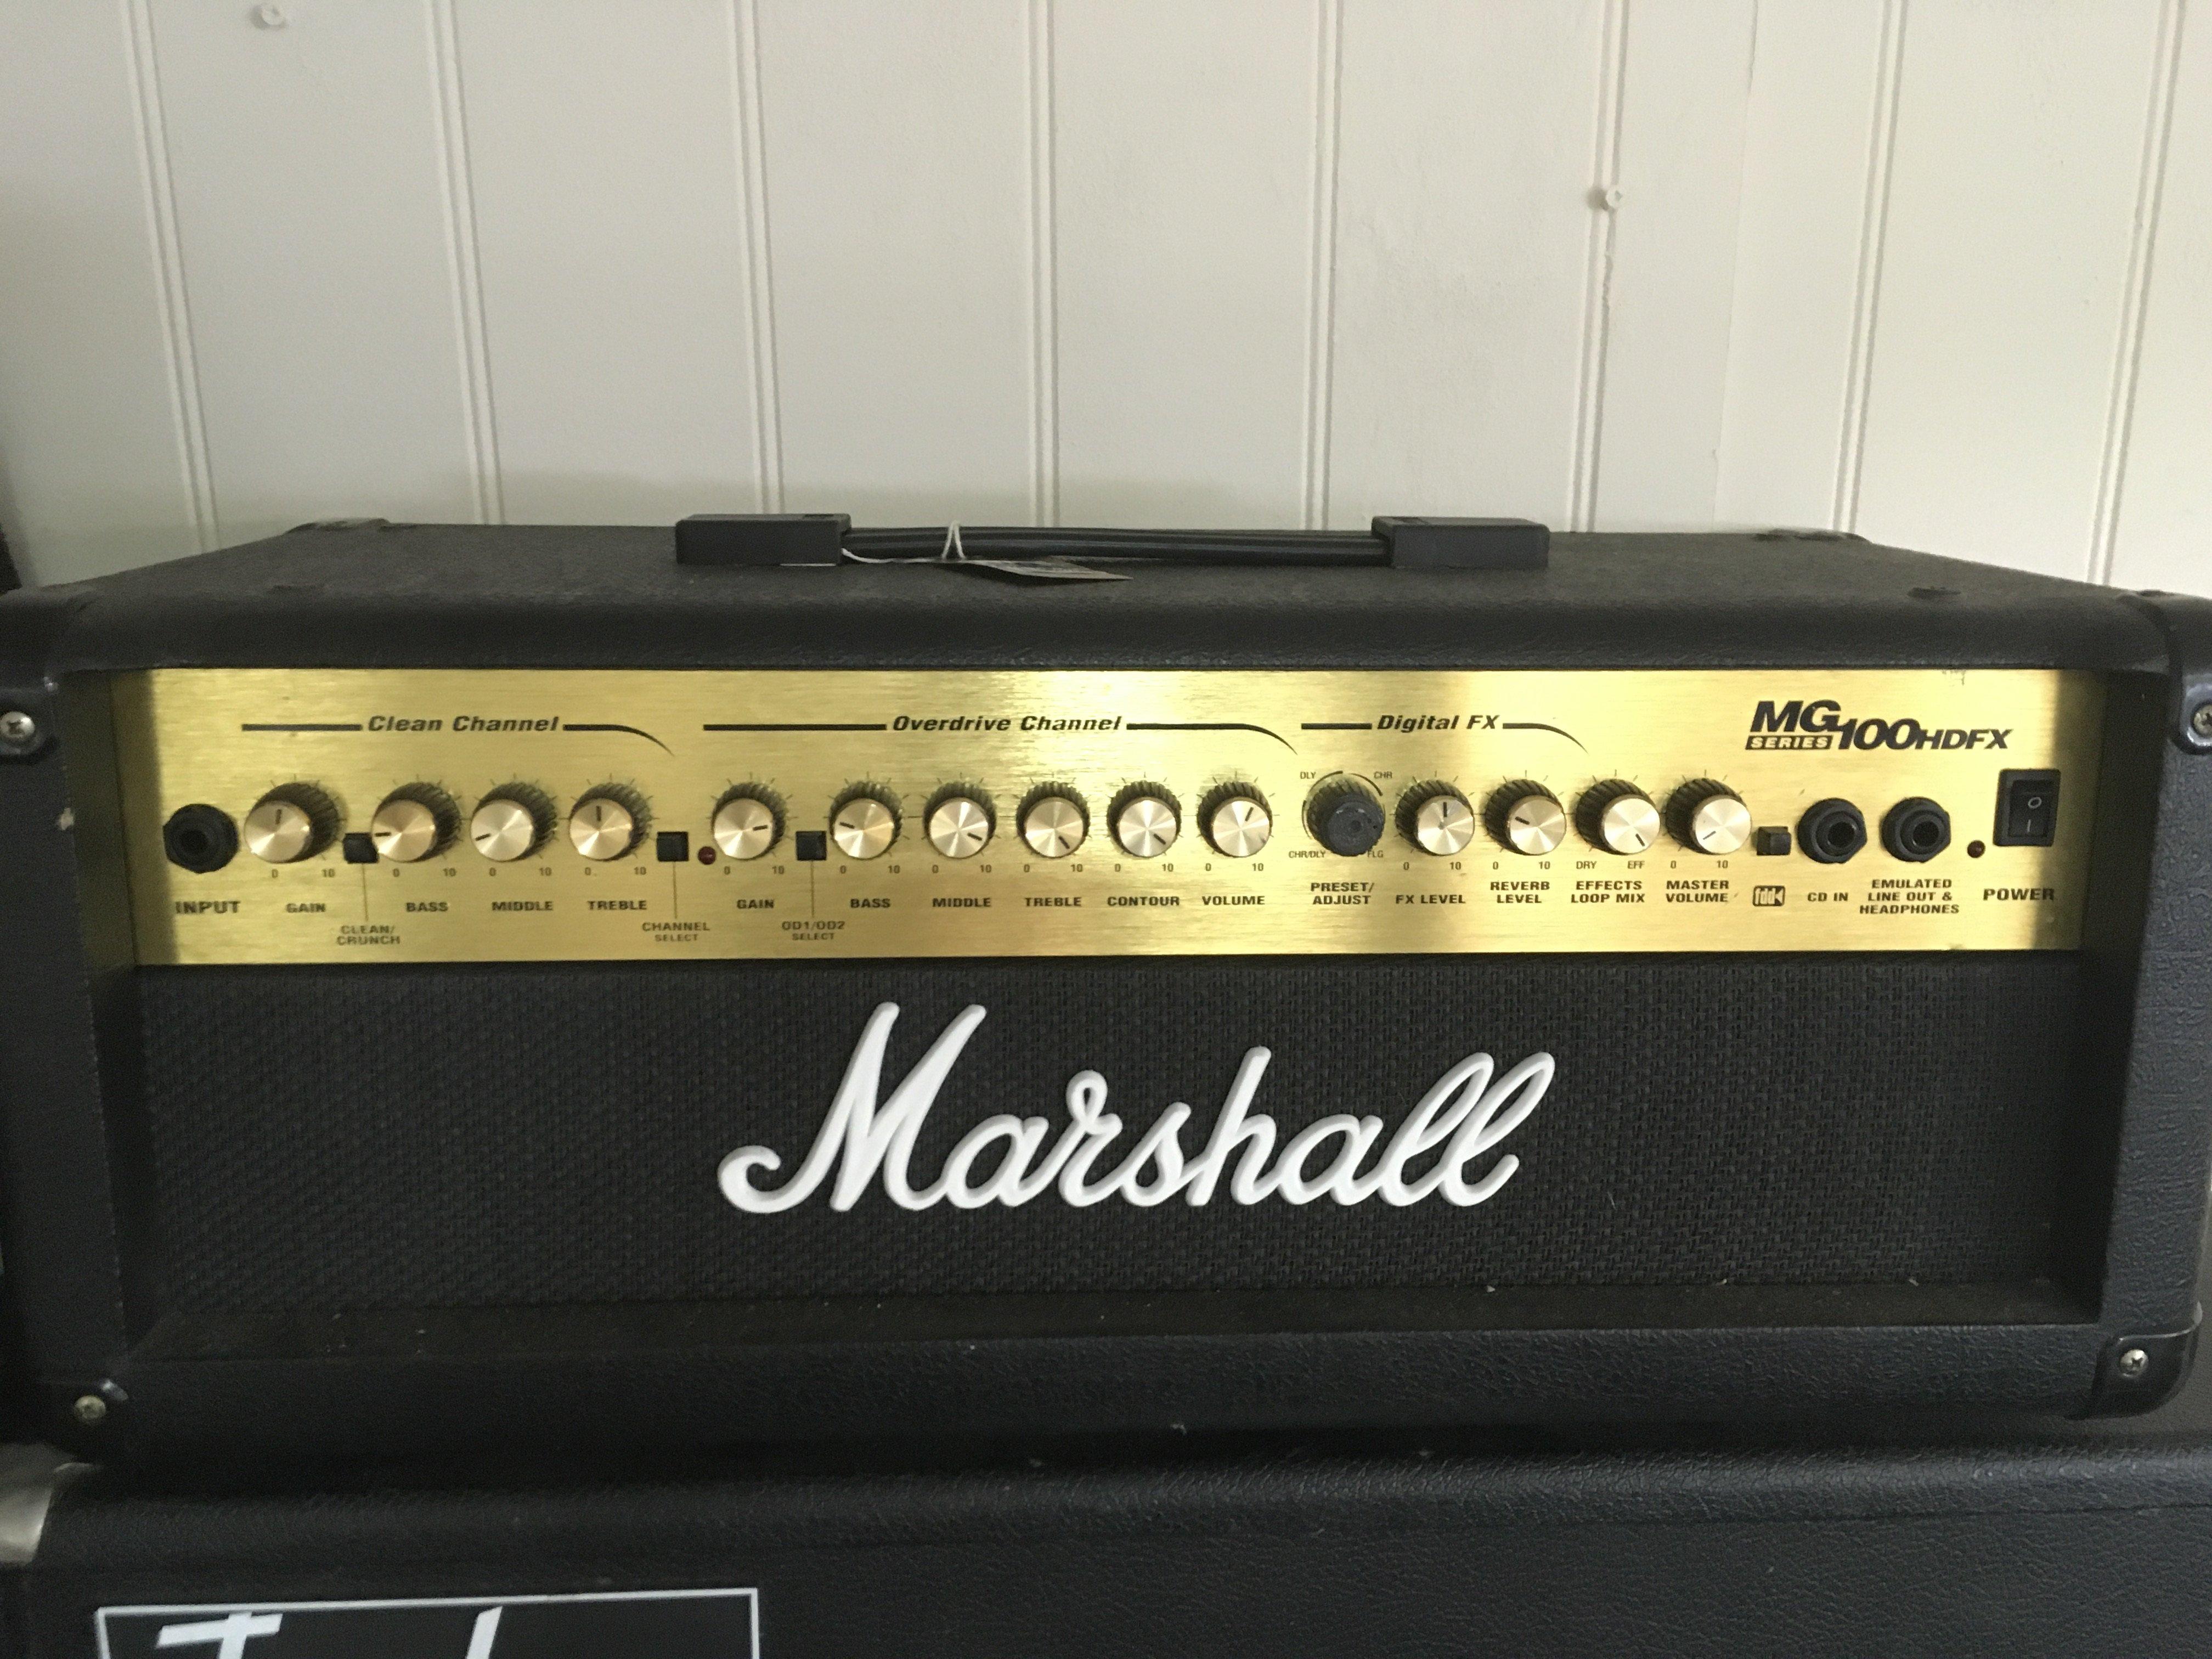 A Marshall MG Series 100 HDFX amplifier head.